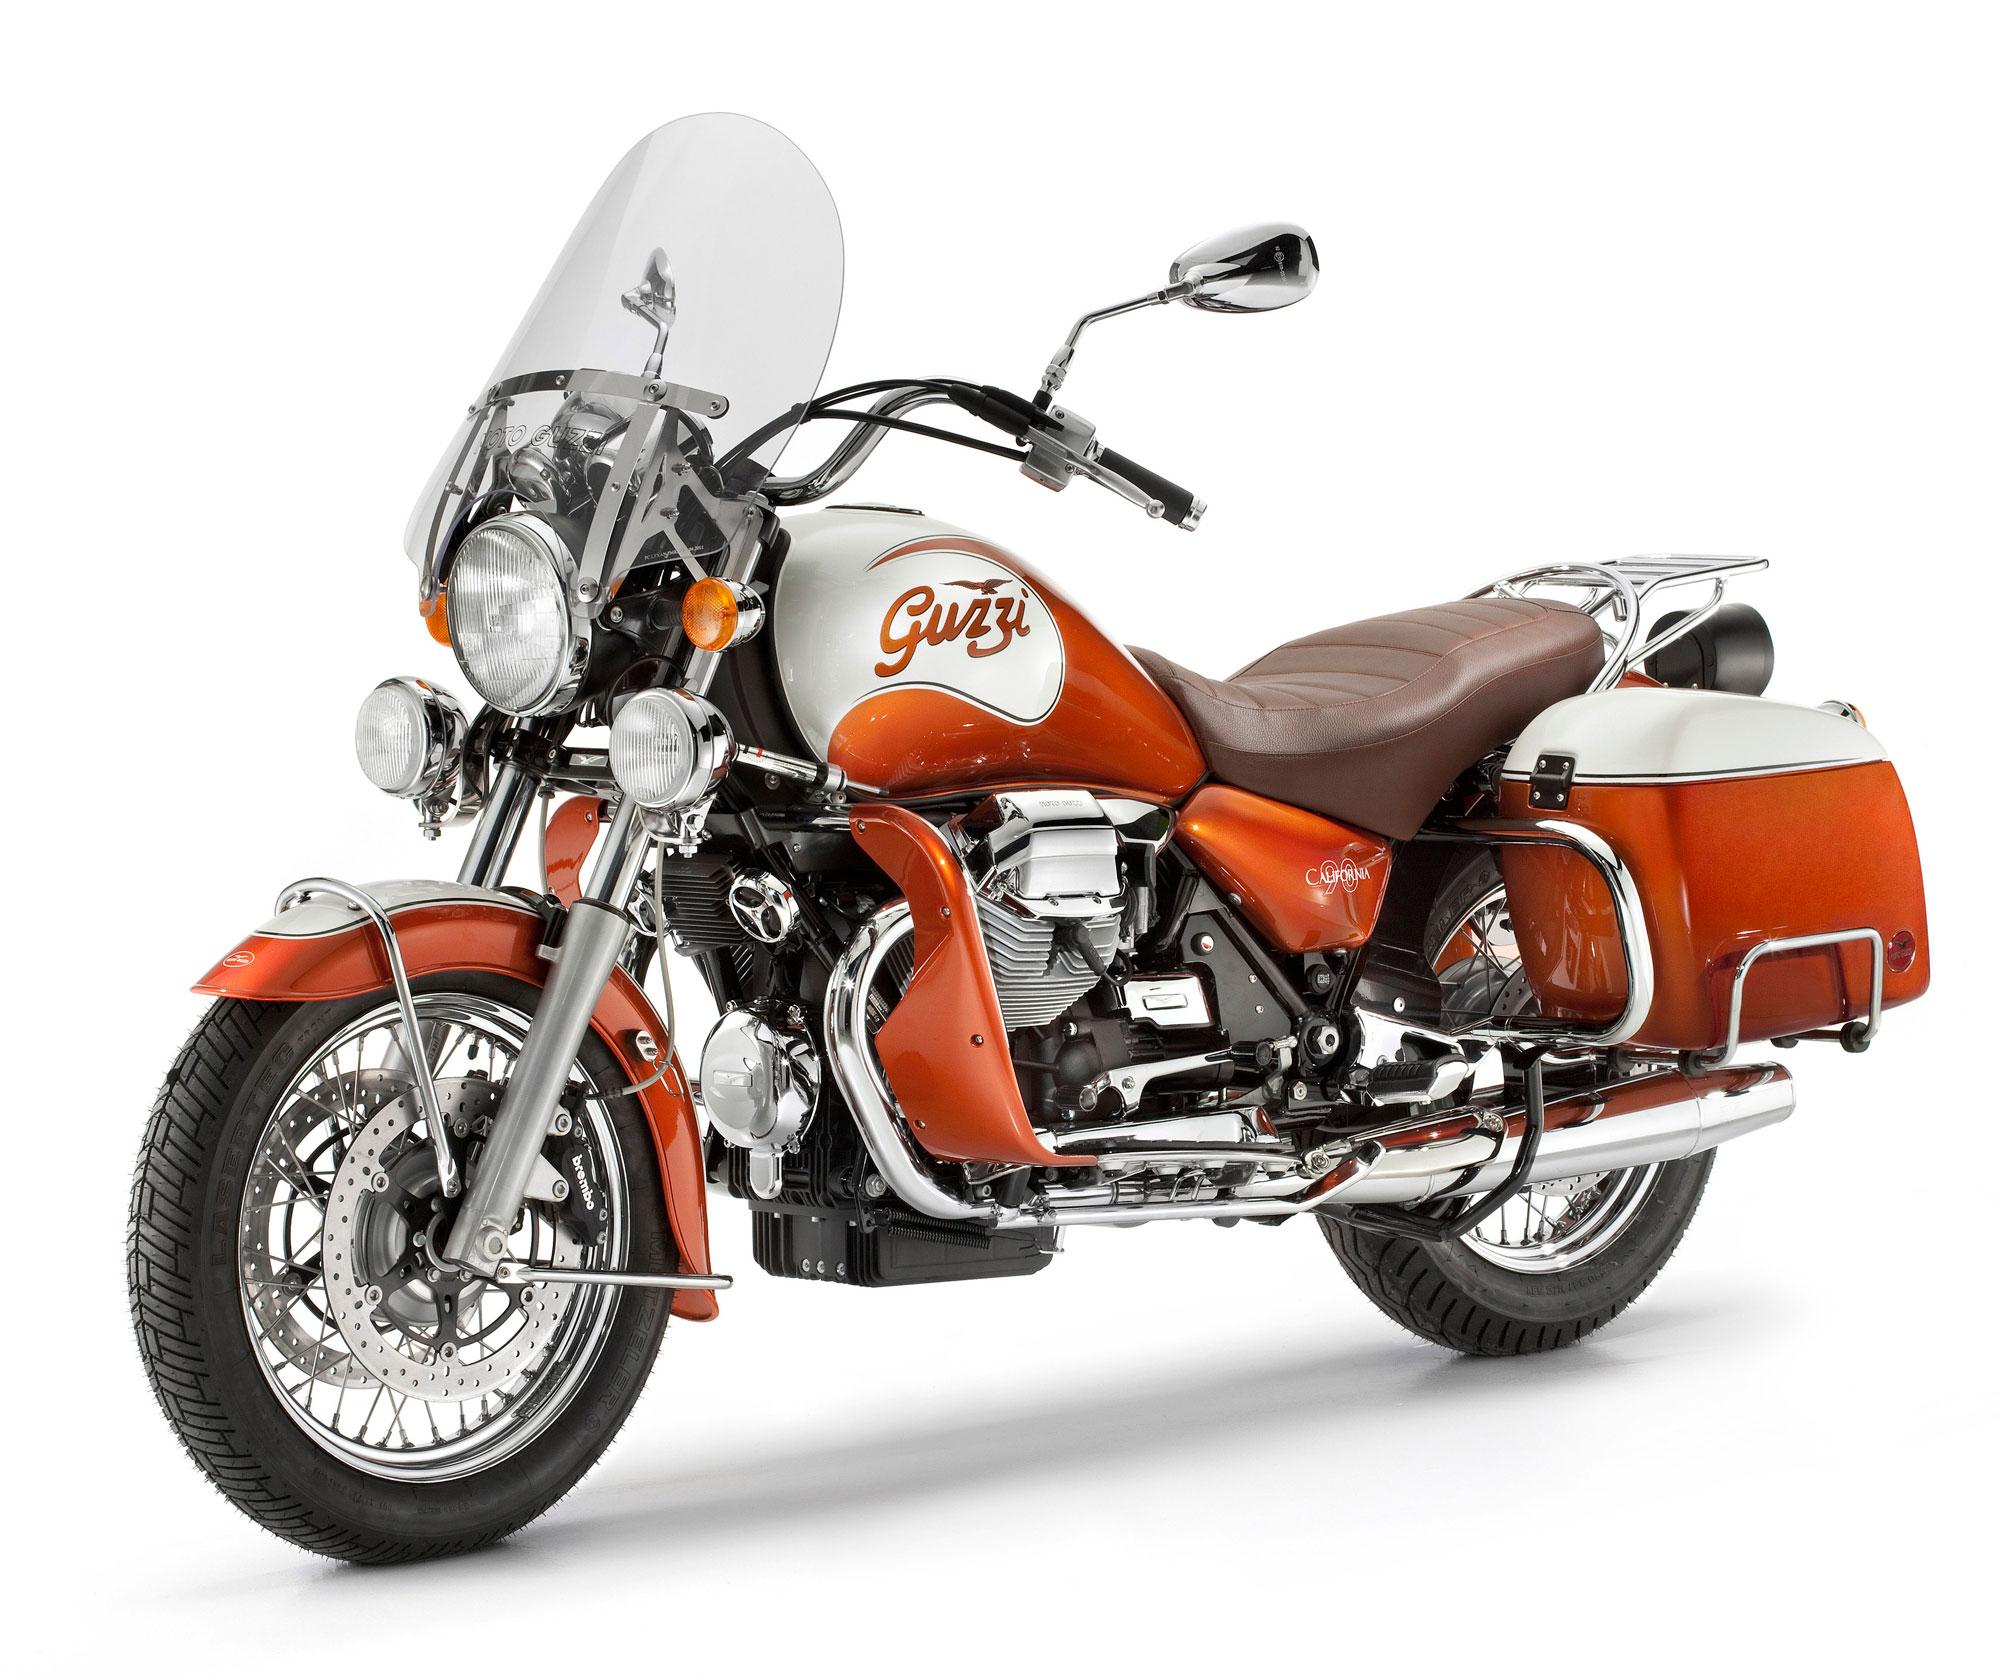 Moto Guzzi California 1100 PX any bike and delivery